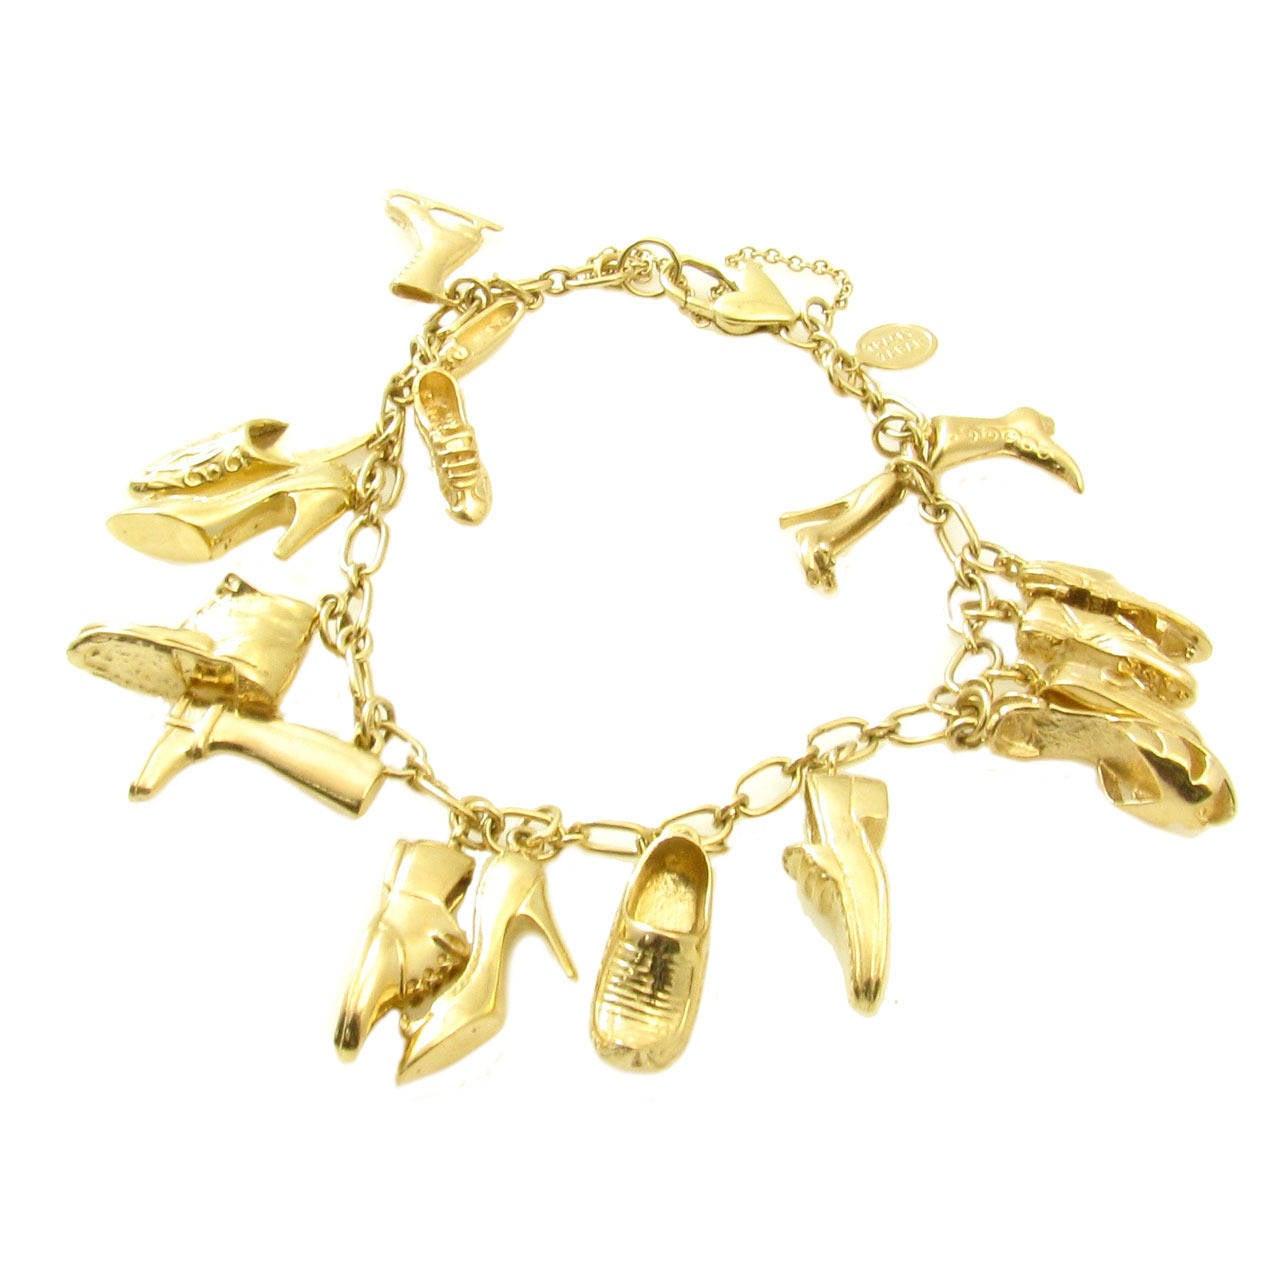 Tracey Zabar Gold Shoe Charm Bracelet 1